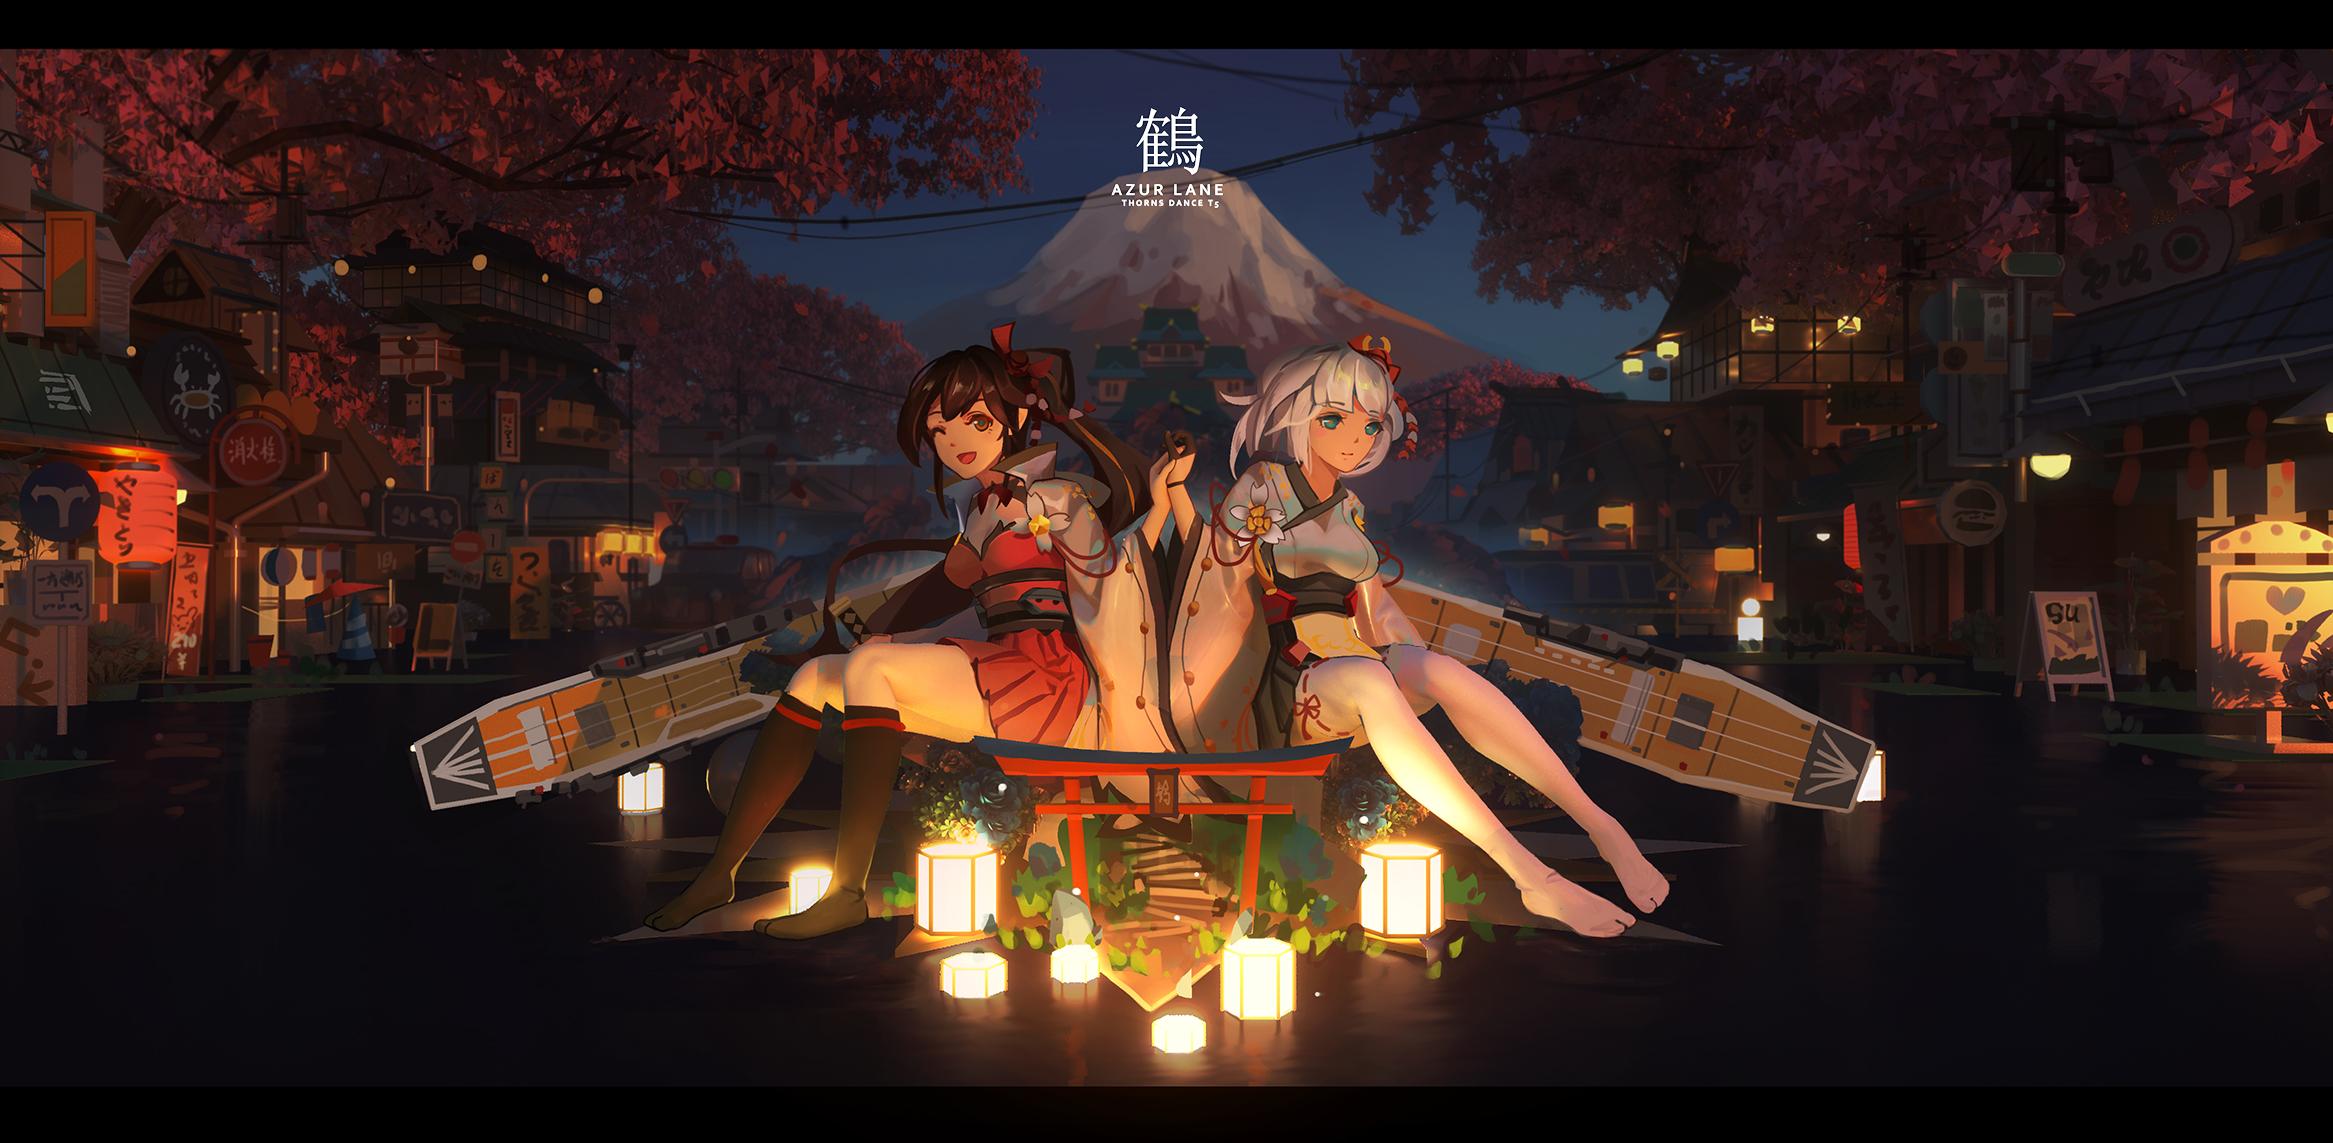 Anime 2333x1143 T5 anime girls Azur Lane zuikaku (Azur Lane) Shoukaku (Azur Lane)